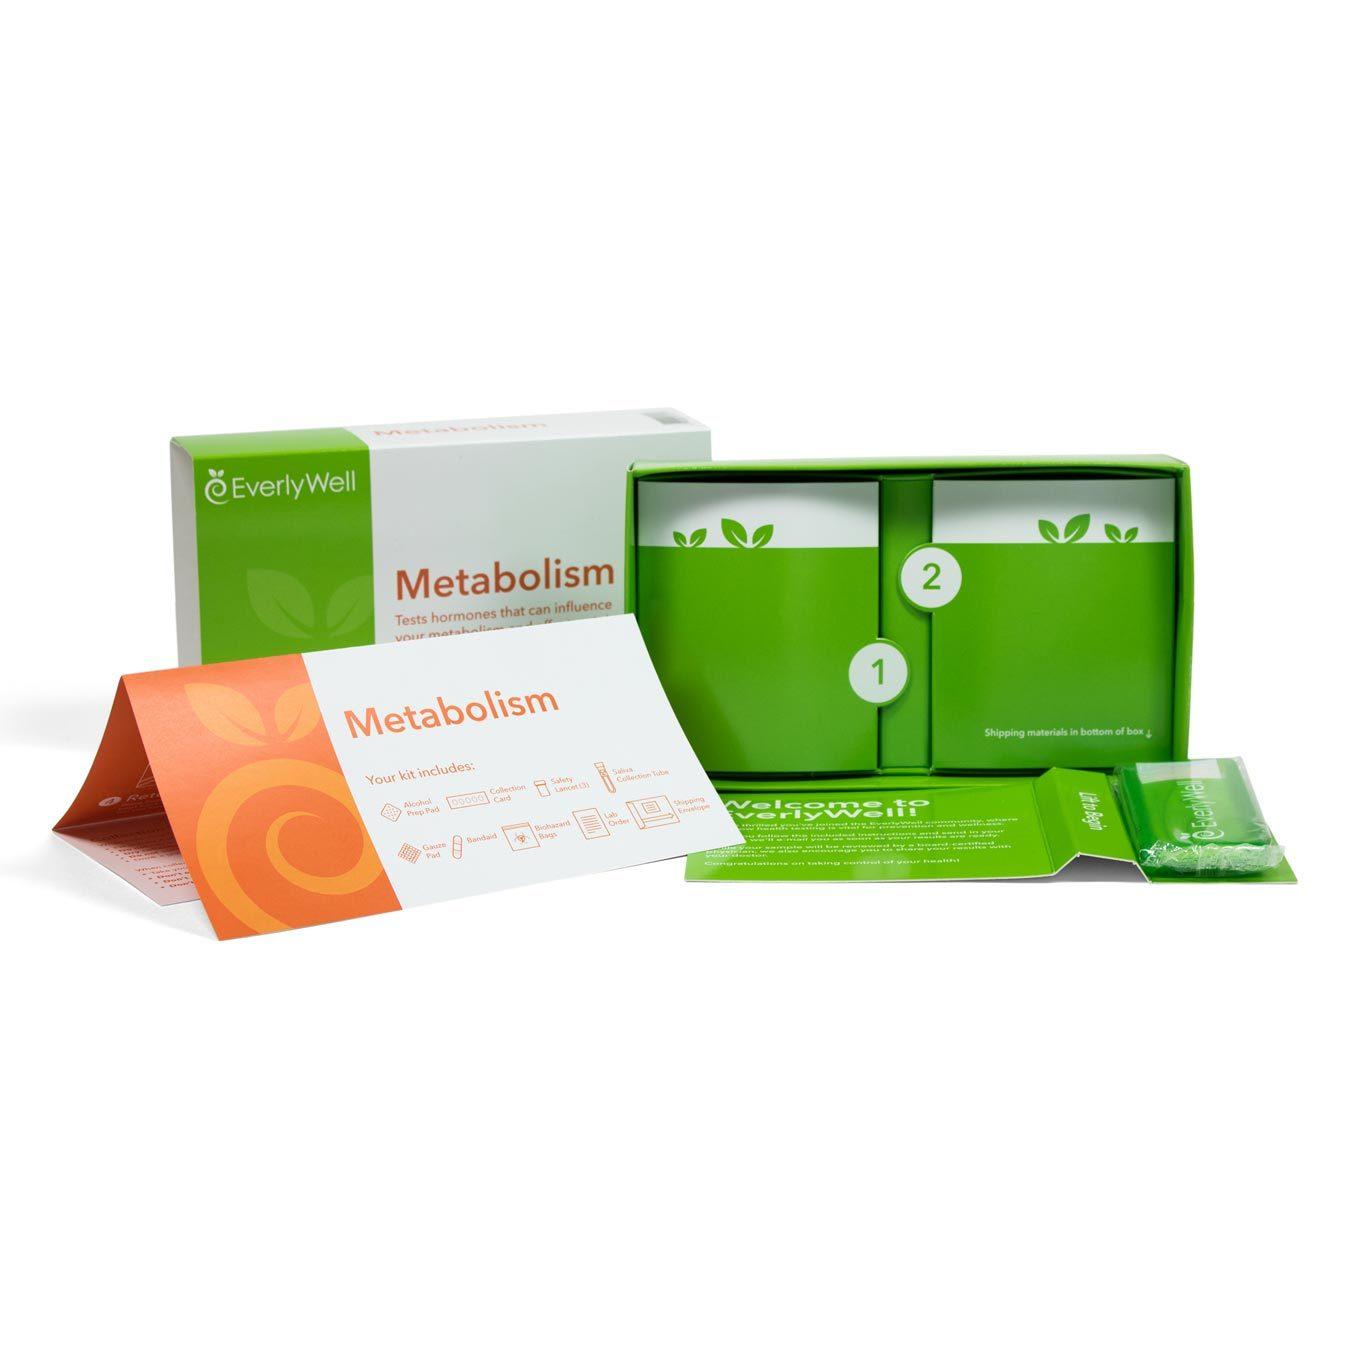 Metabolism Test